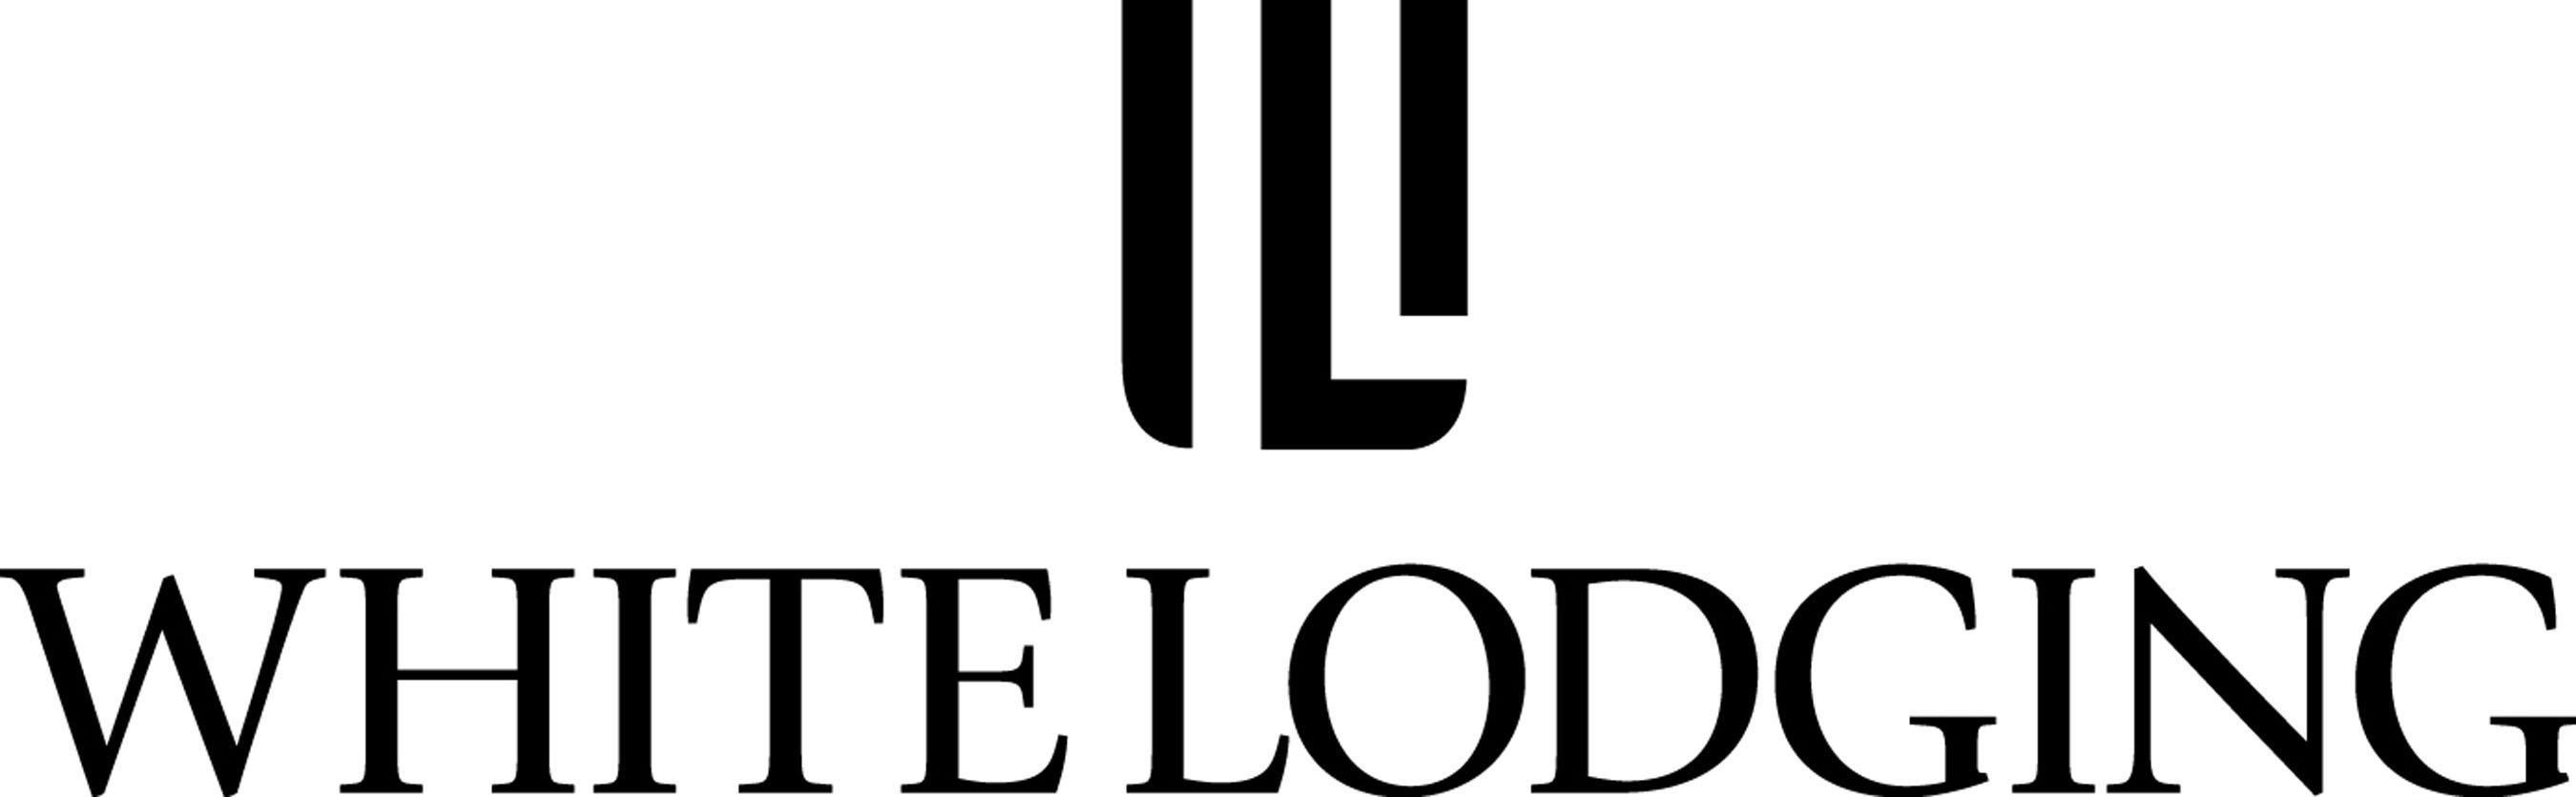 White Lodging Logo photo - 1